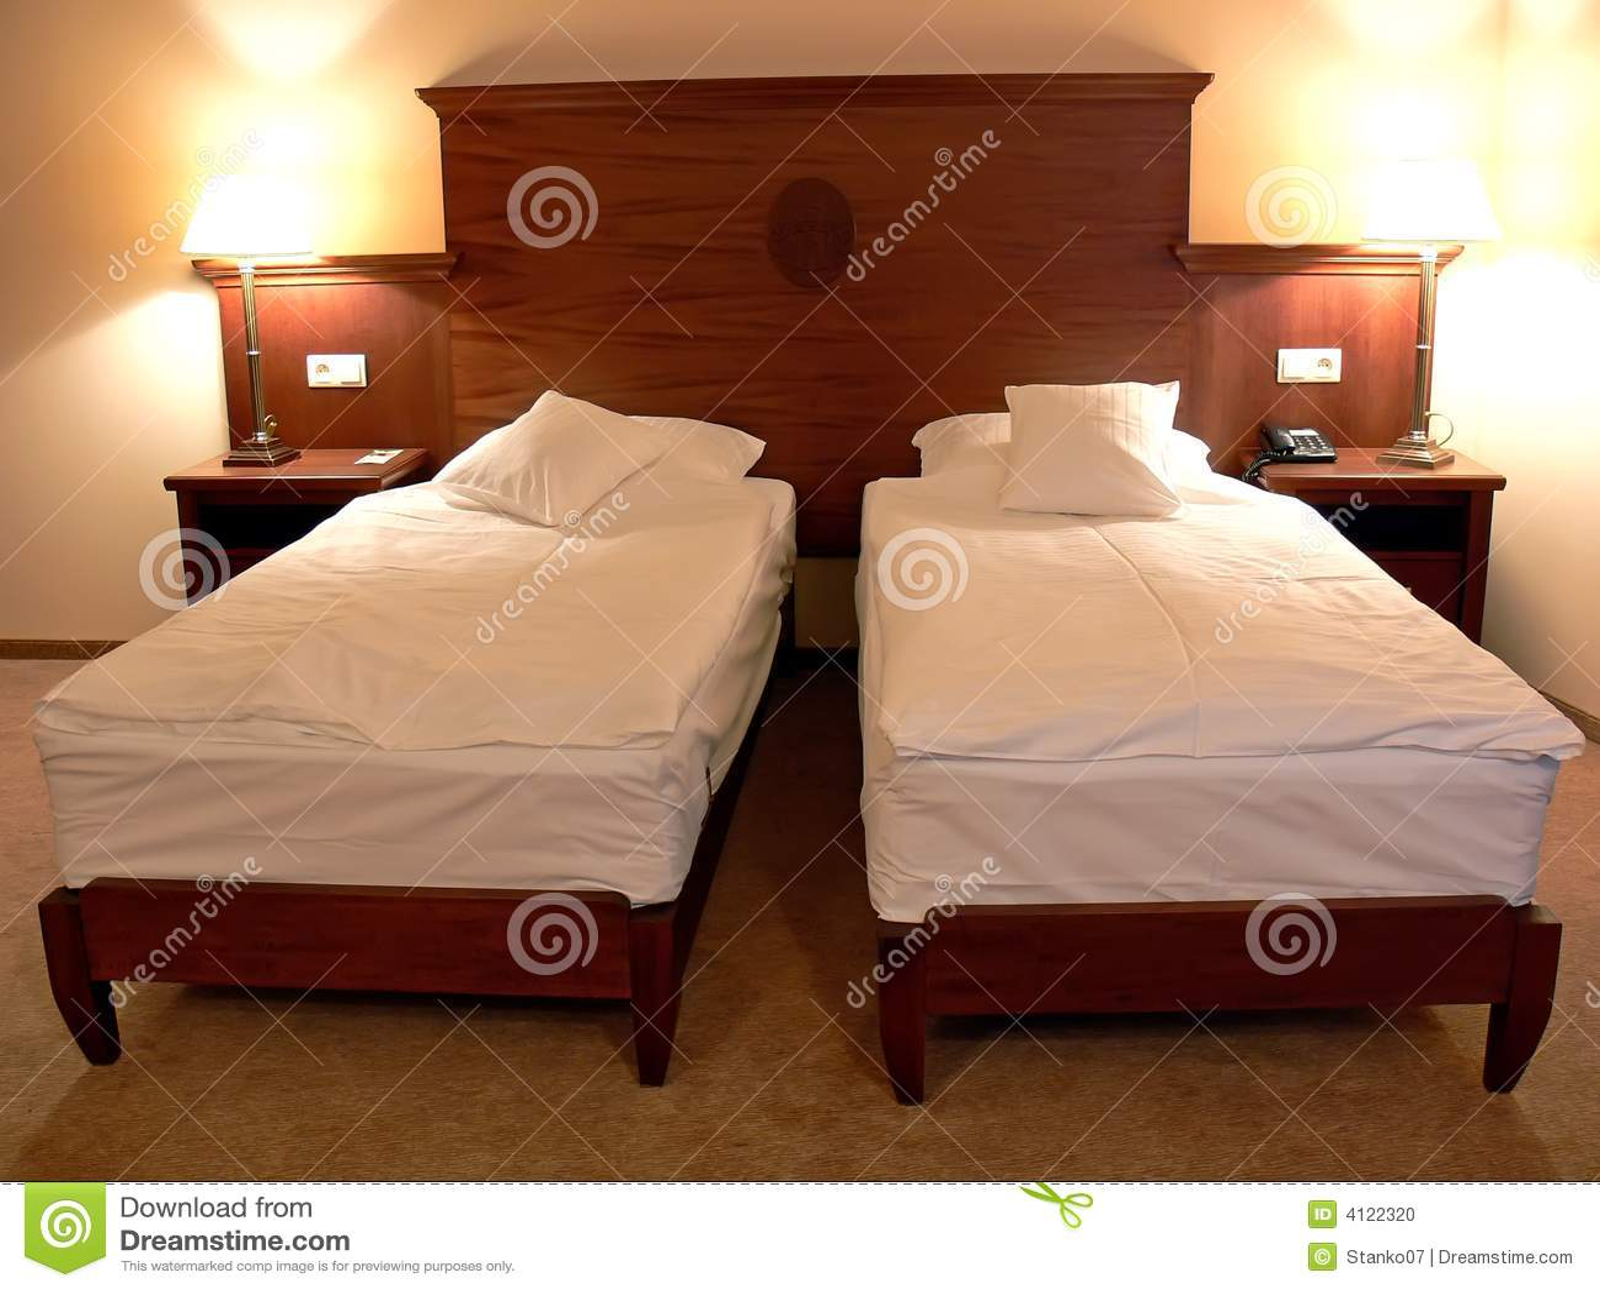 Cama matrimonial grande foto de archivo imagen 4122320 for Cama matrimonial con cama individual abajo